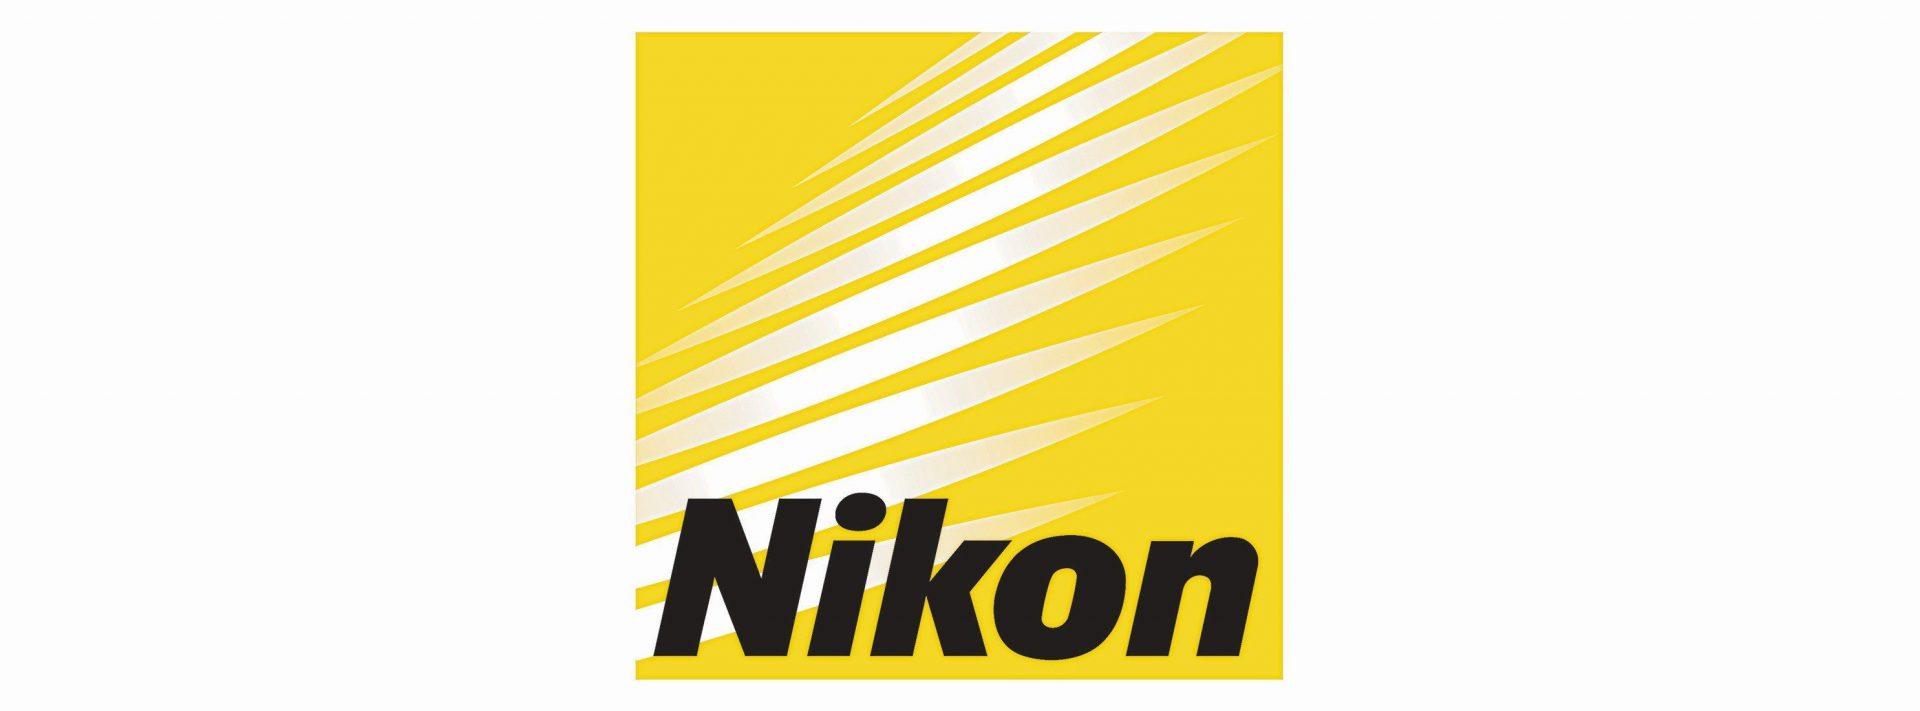 Logo 2970x1100 Nikon